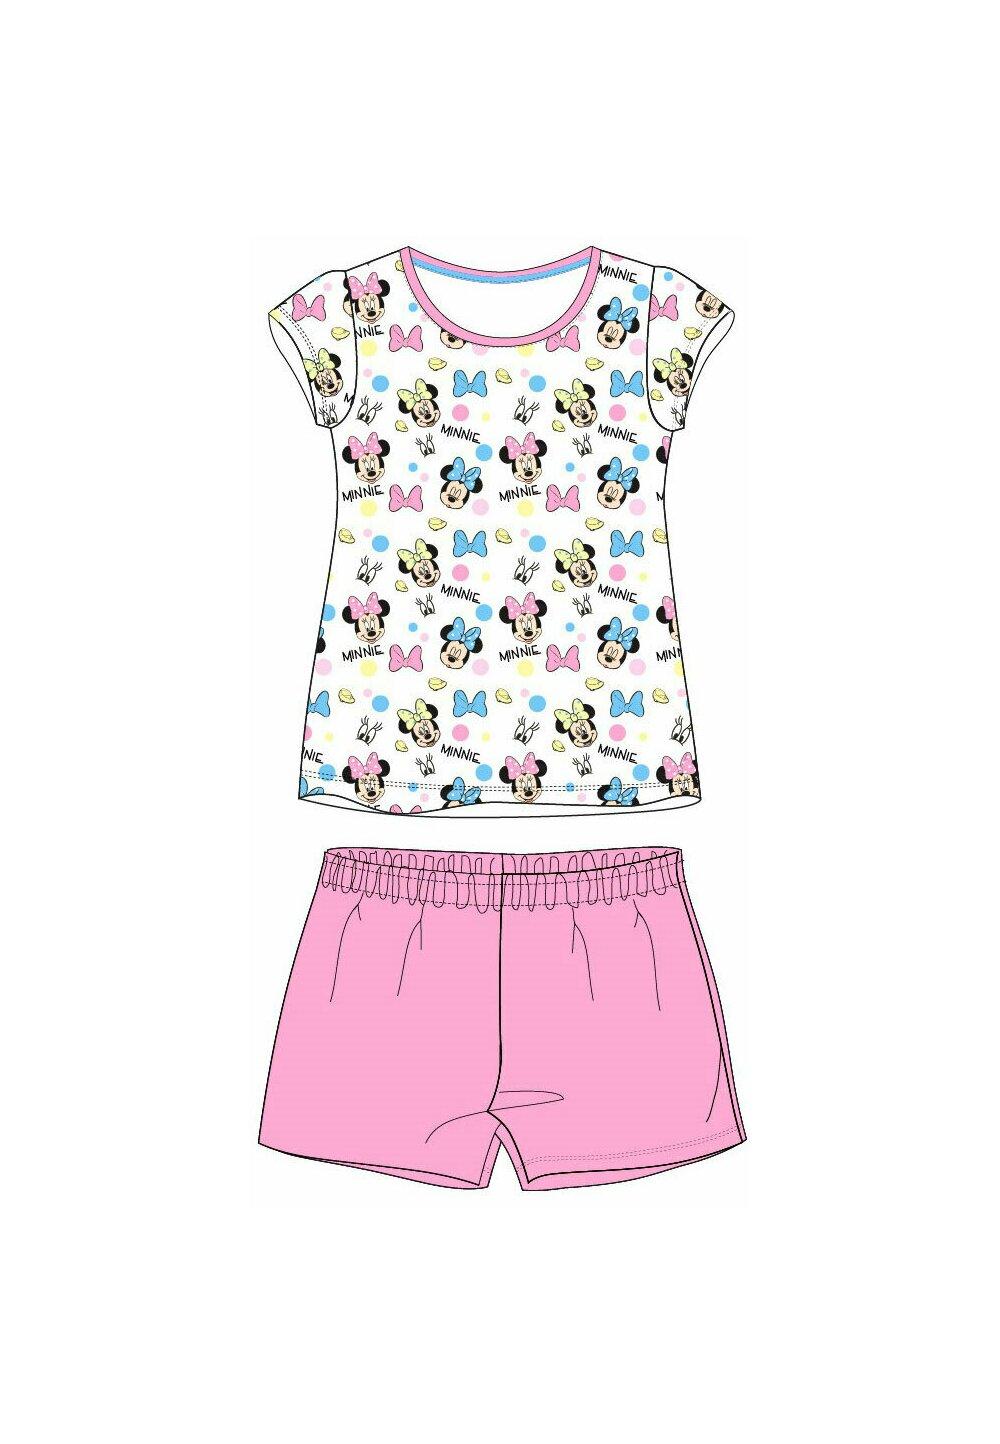 Pijama maneca scurta, multi Minnie, roz imagine